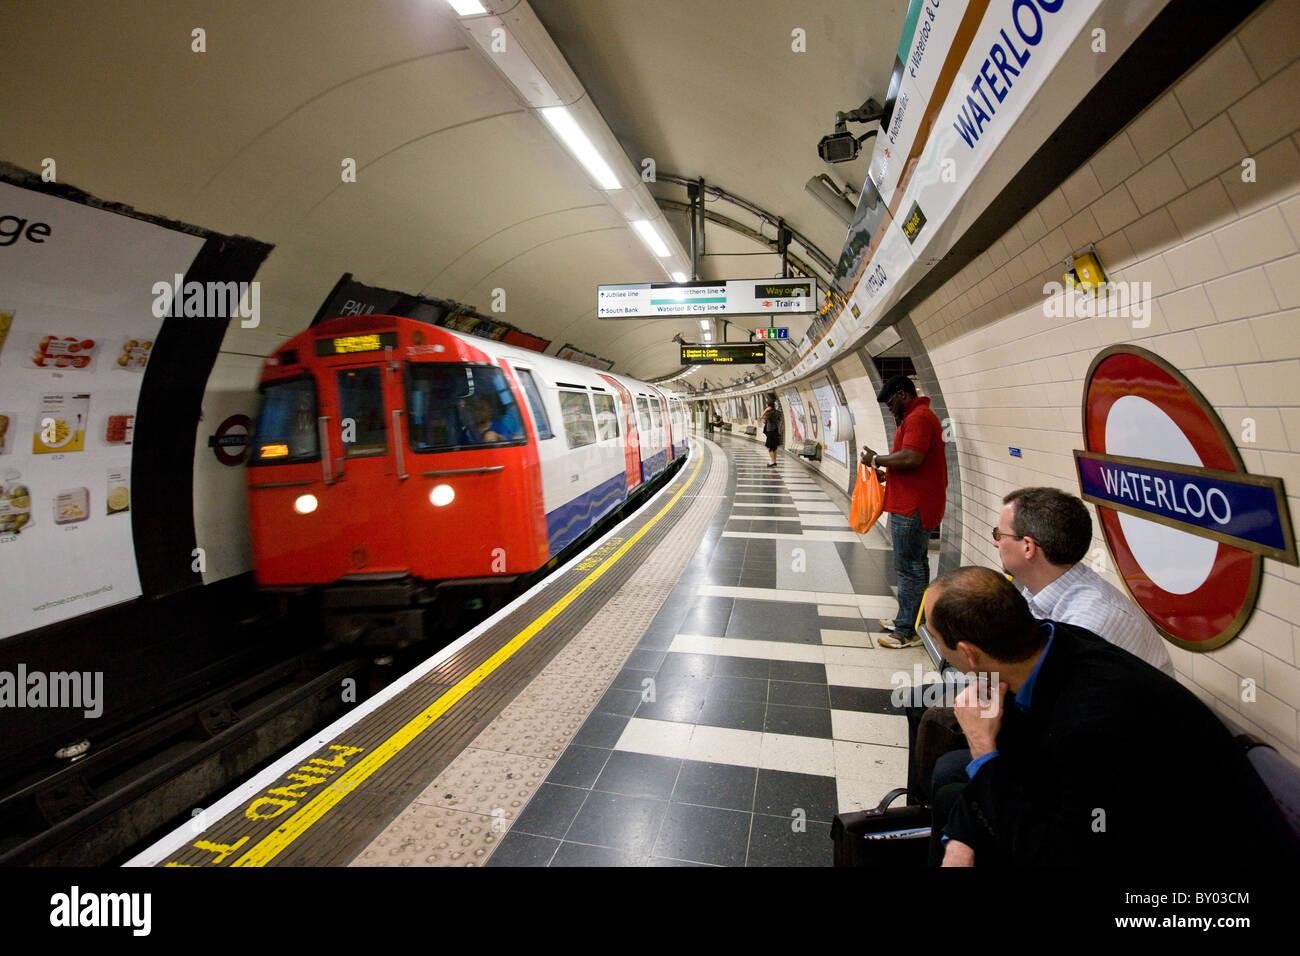 Underground at Waterloo tube station - Stock Image